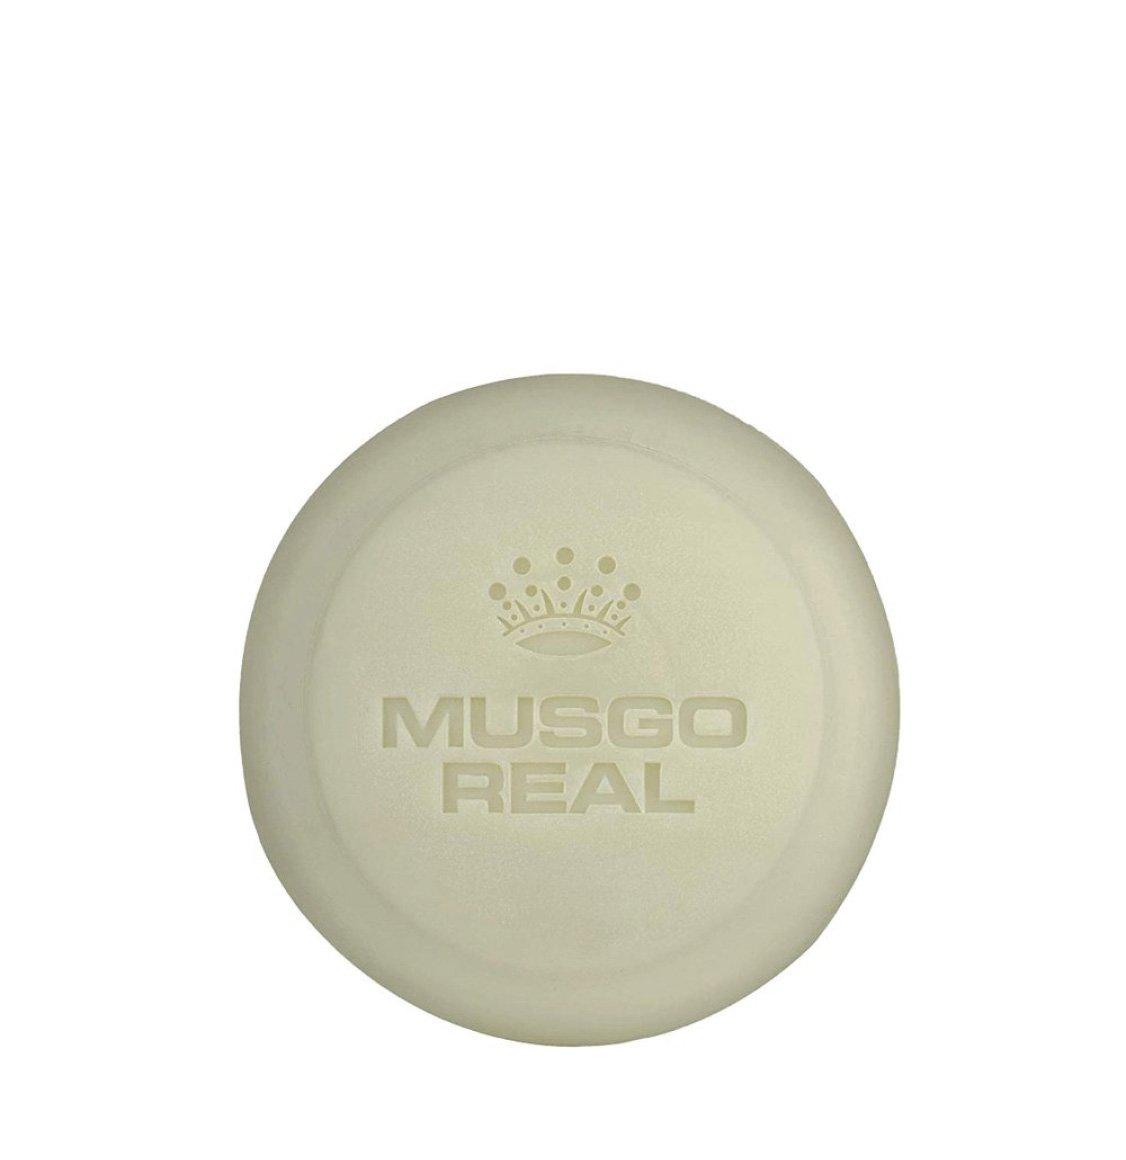 Claus Porto Musgo Real Classic Scent Shaving Soap 125g